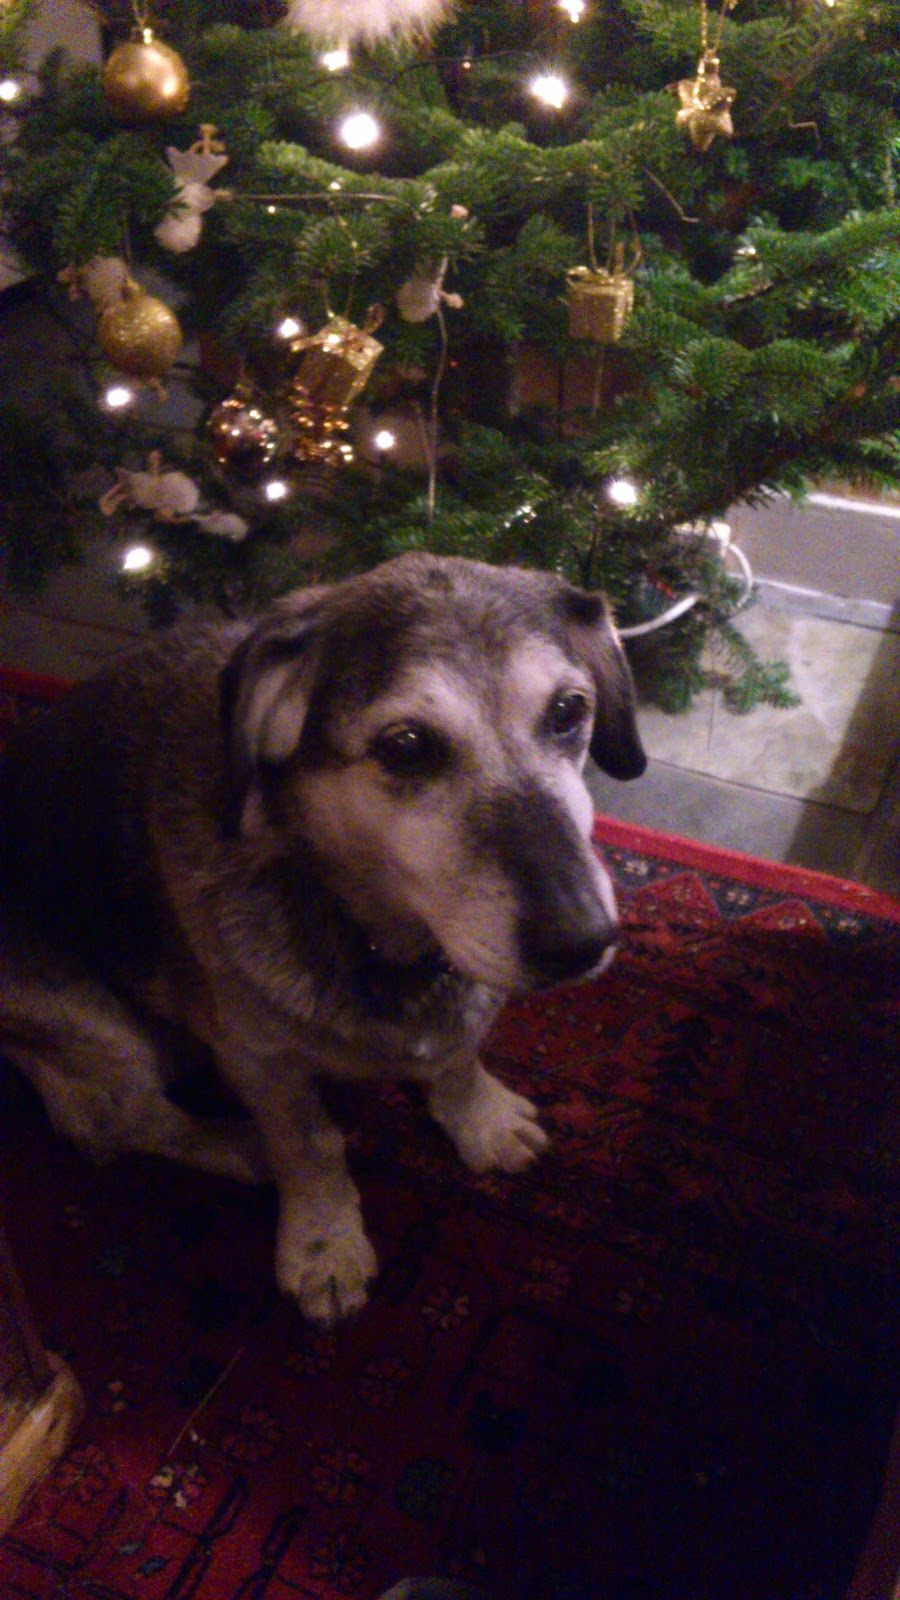 Jemma the dog by the Christmas tree